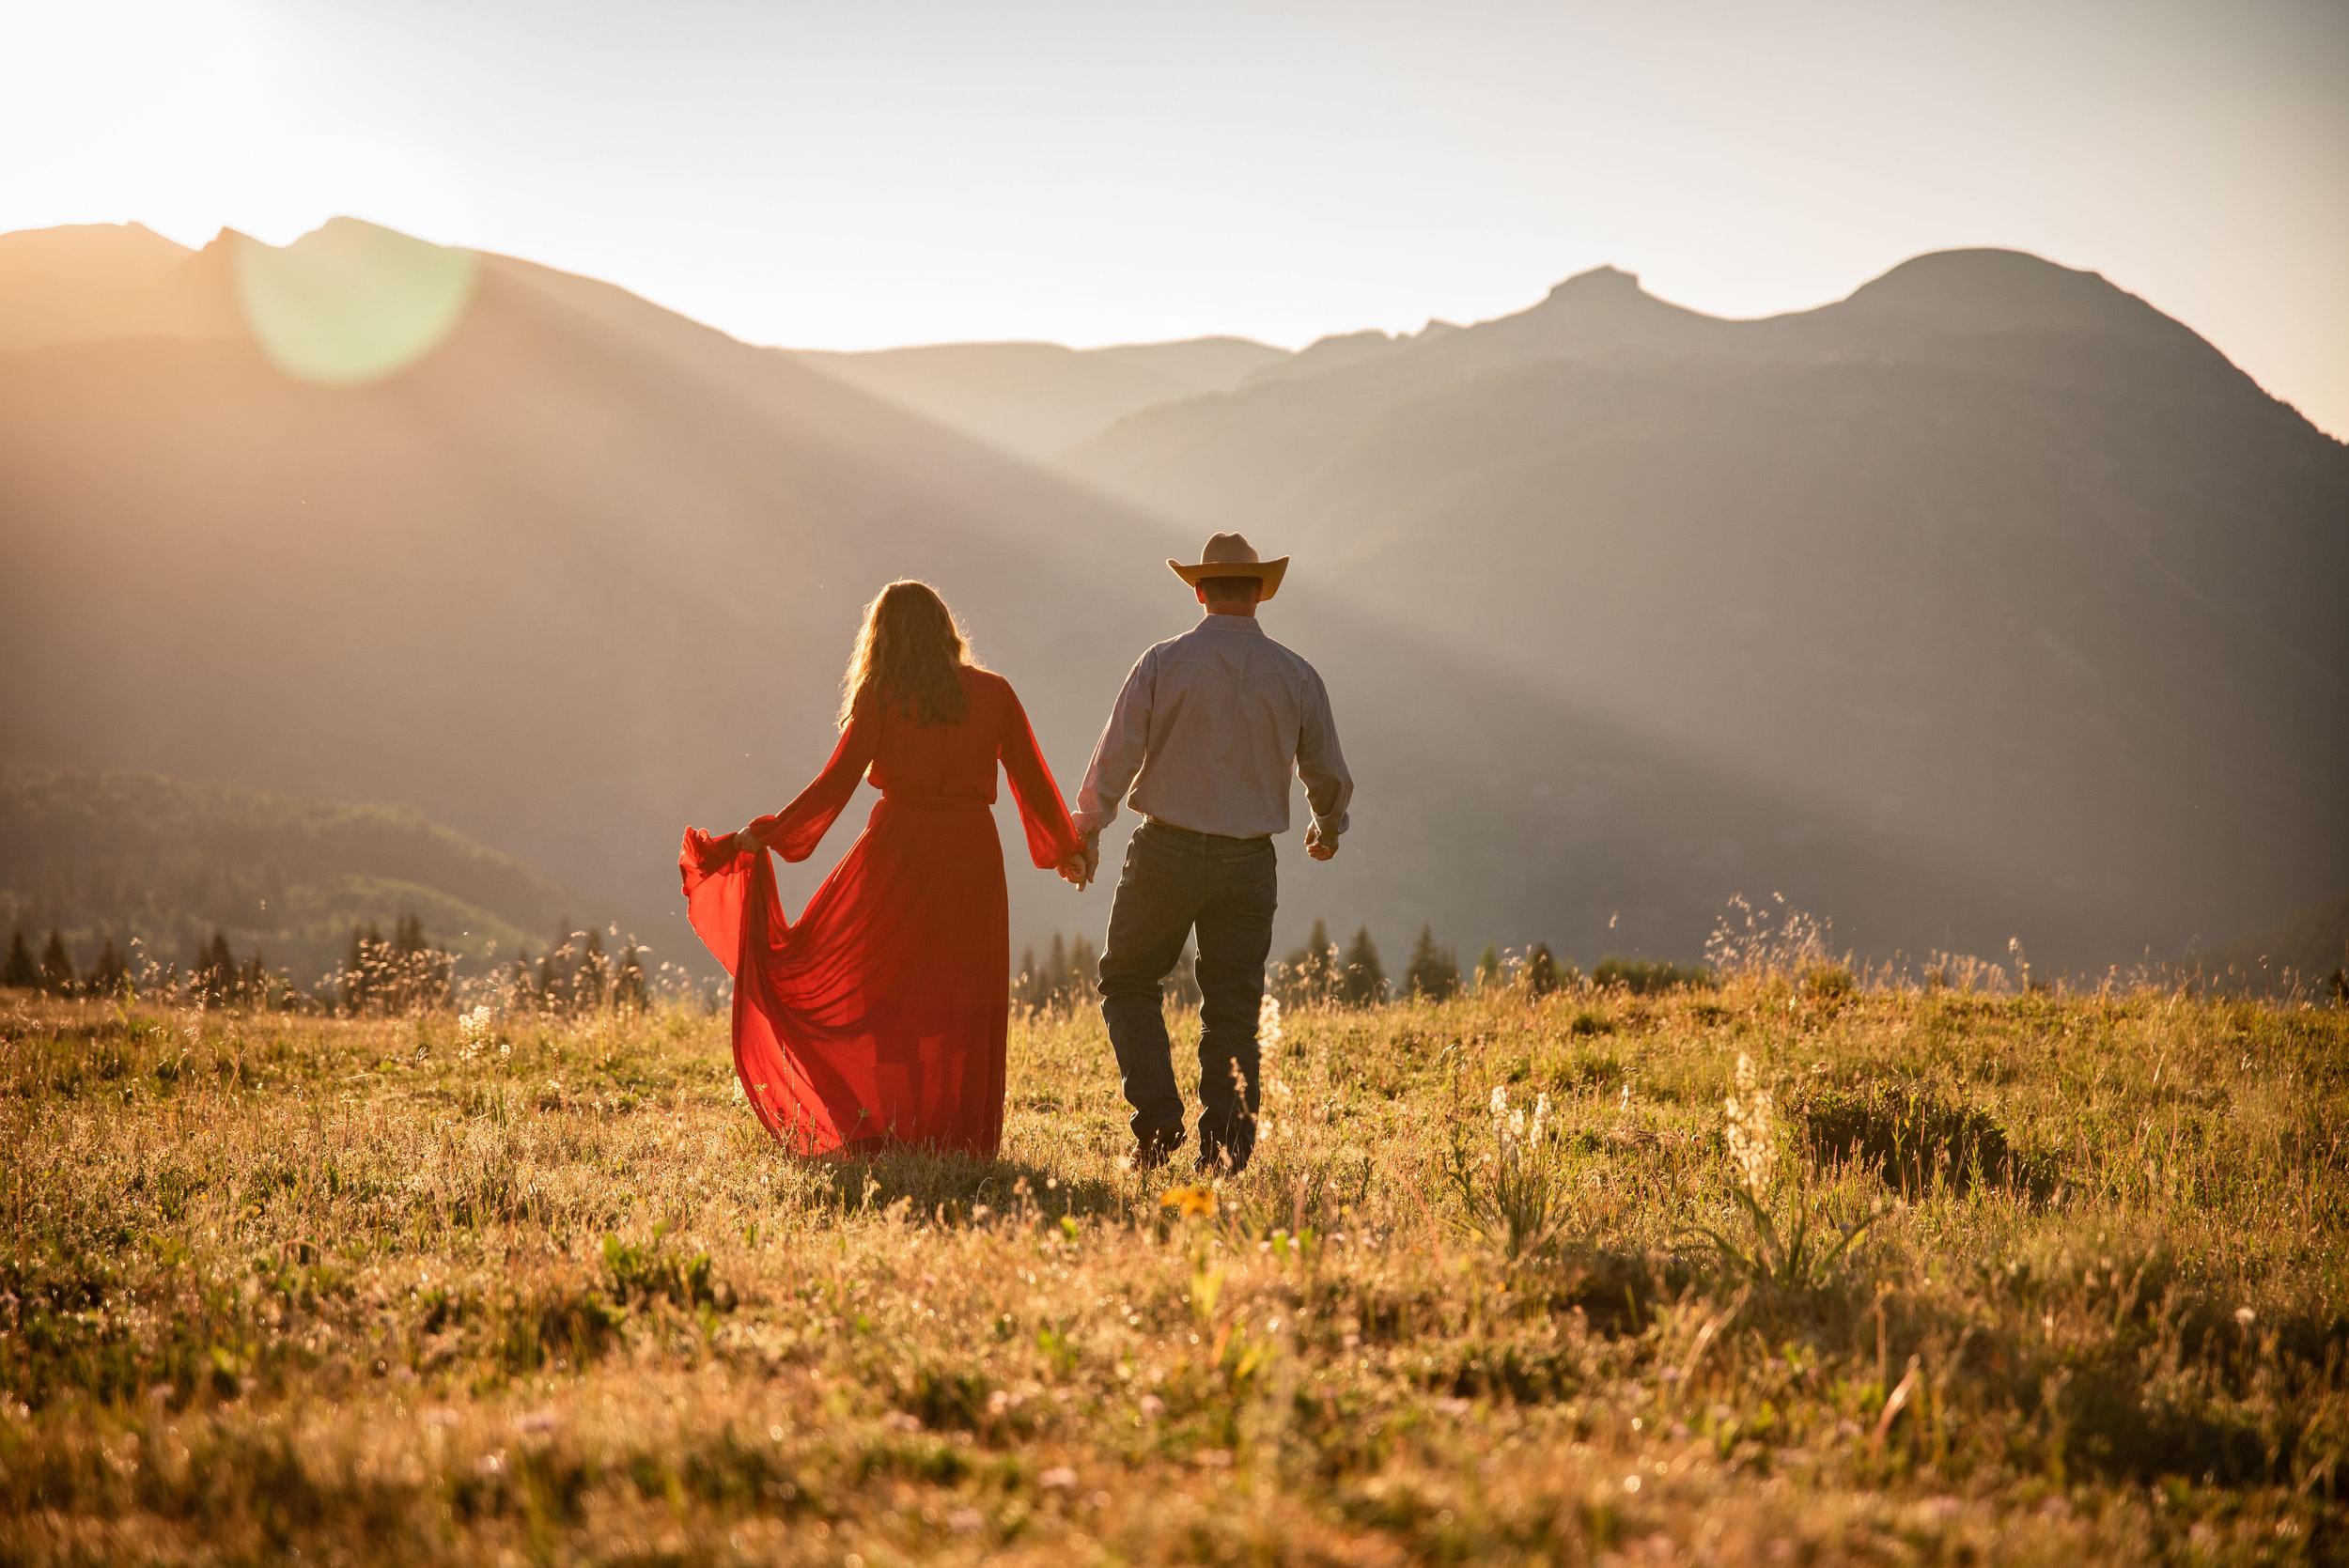 Engagement Photography // Monika B. Leopold Photography // Durango, Colorado